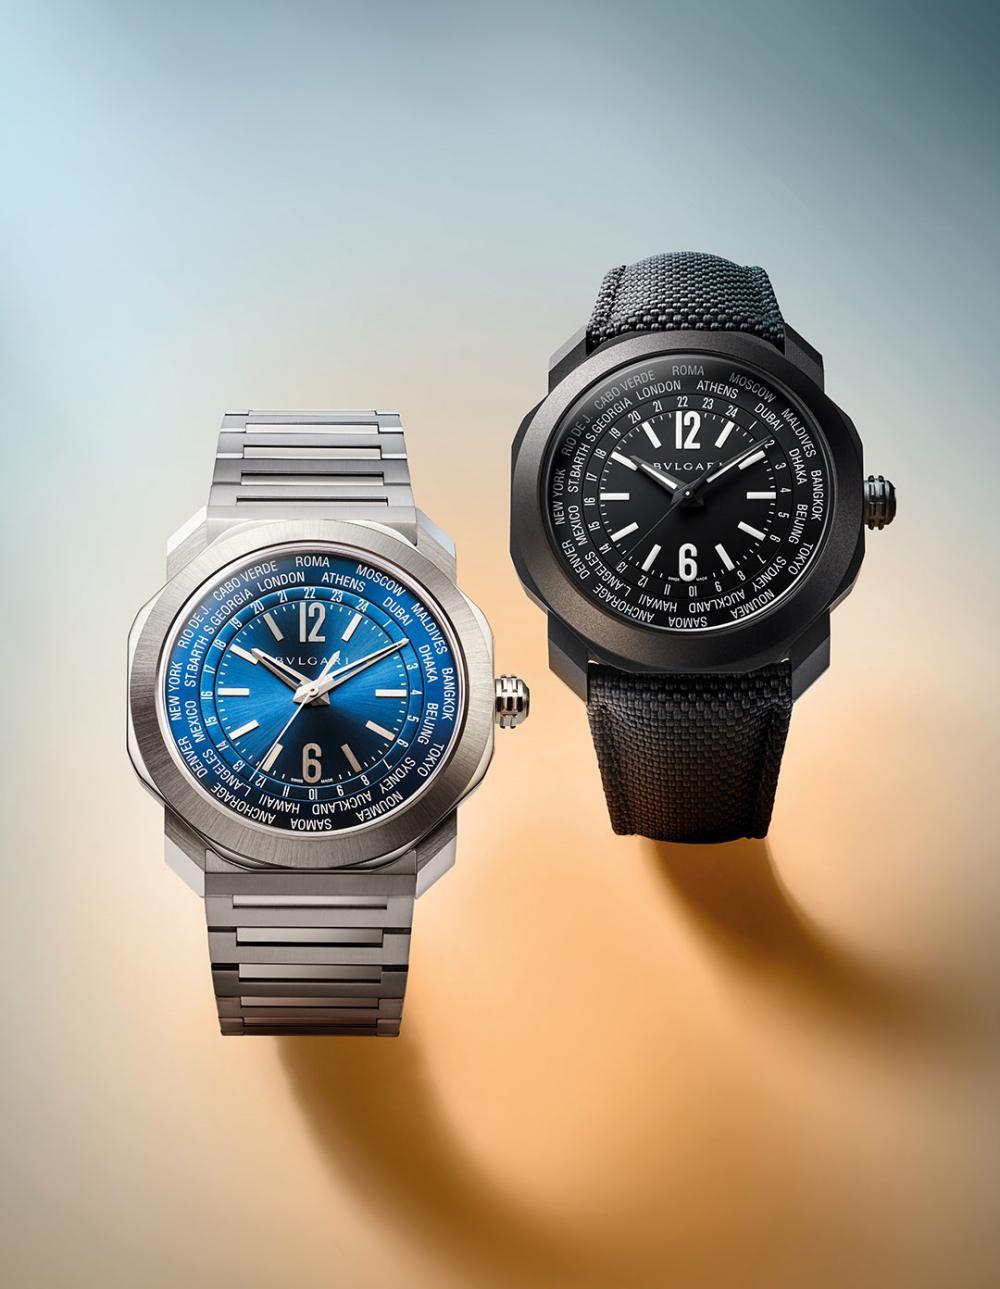 bvlgari octo roma worldtimer pair - 一览 Geneva Watch Days 2021 最受瞩目的6款腕表